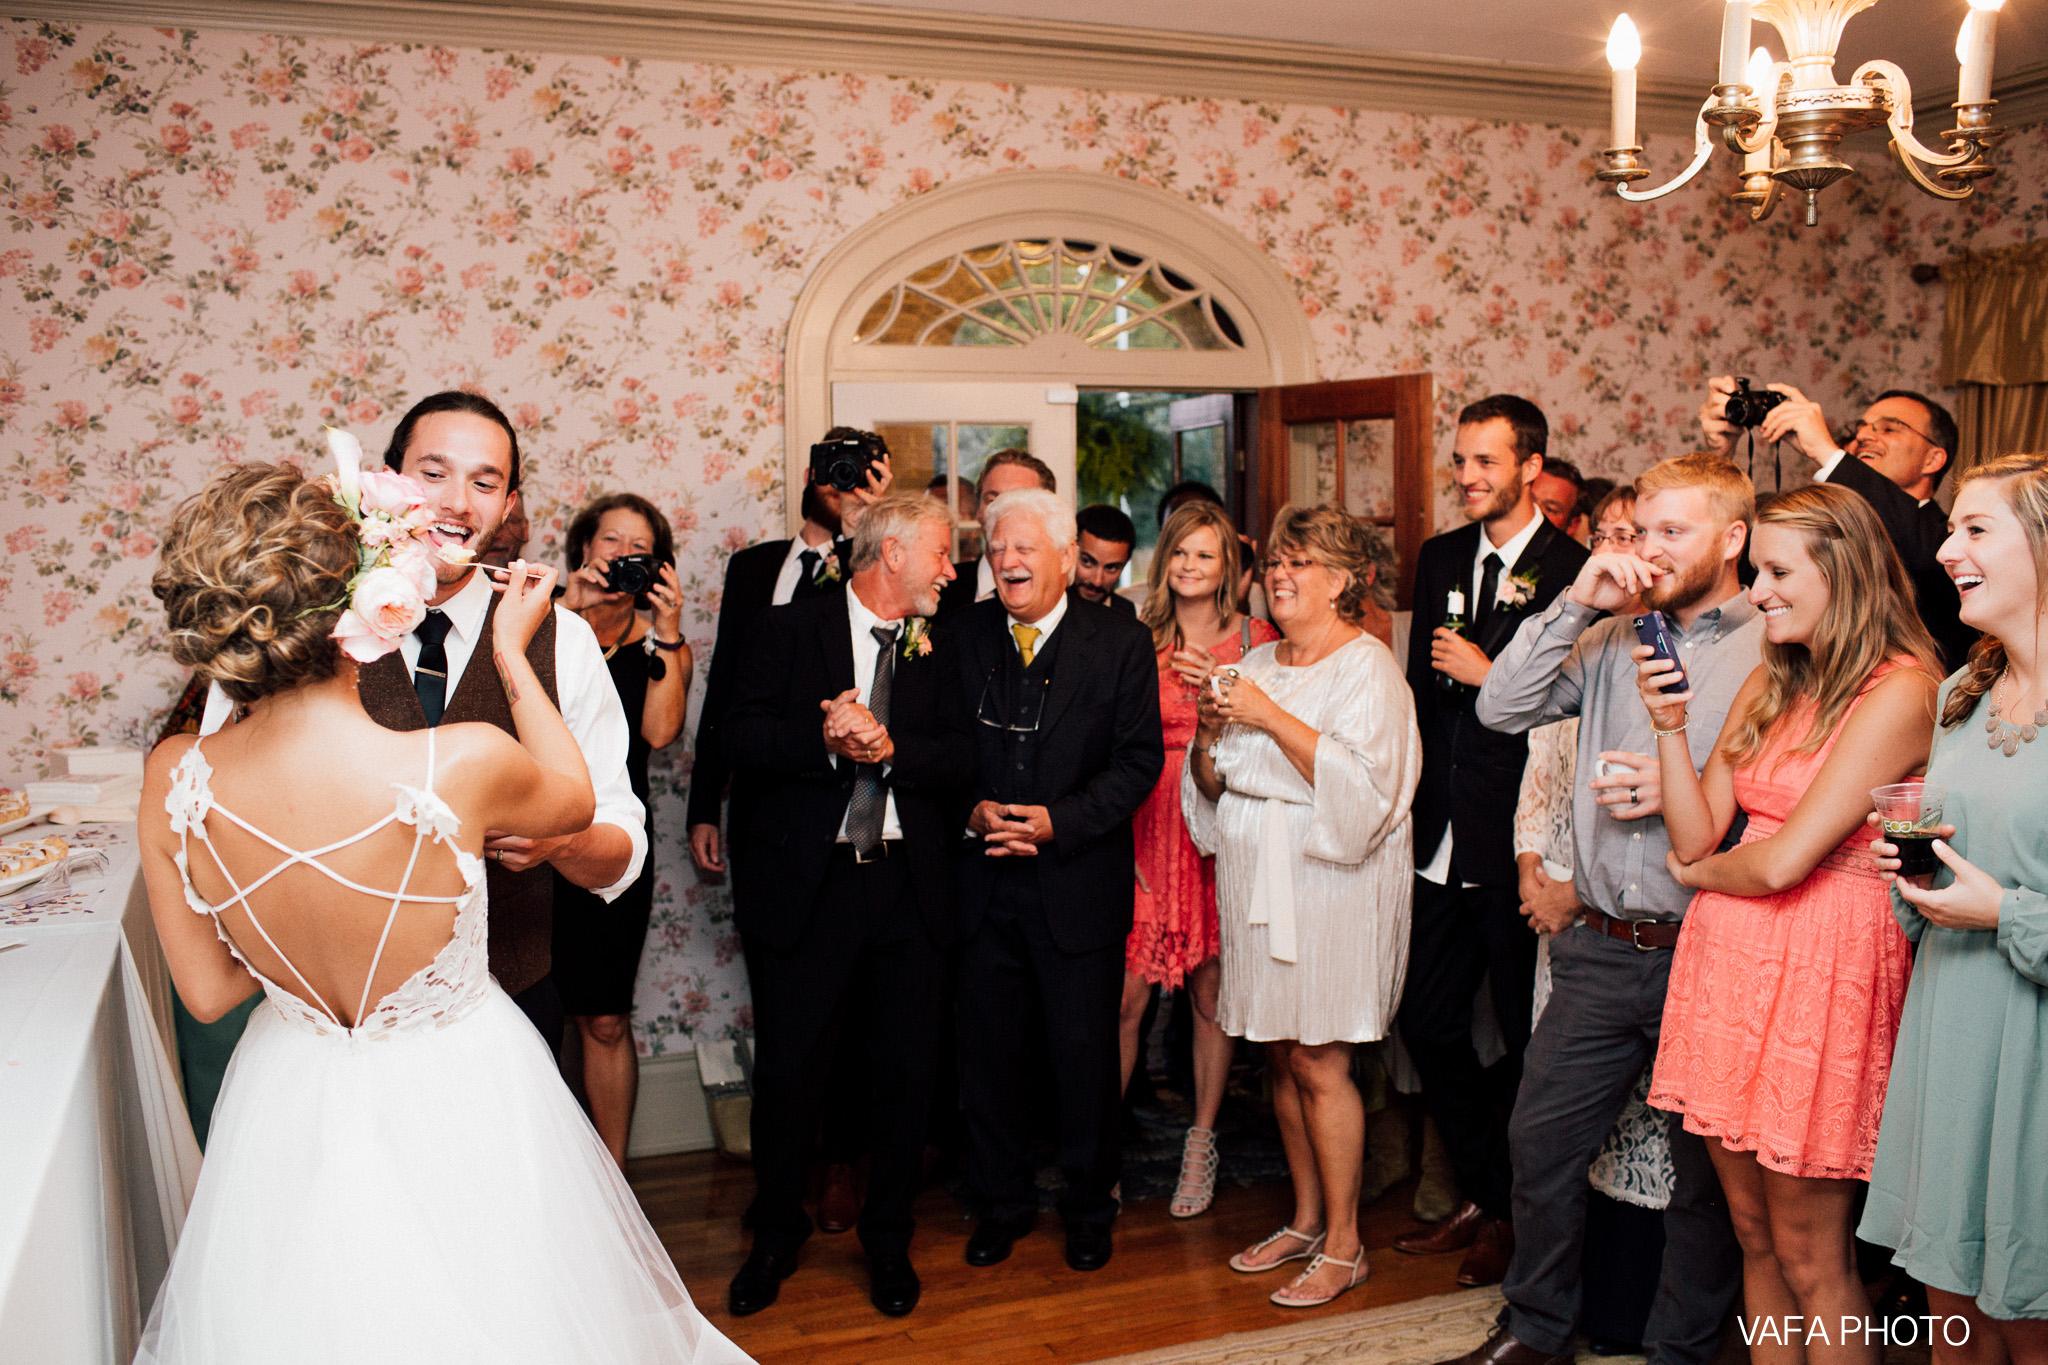 The-Felt-Estate-Wedding-Kailie-David-Vafa-Photo-1039.jpg